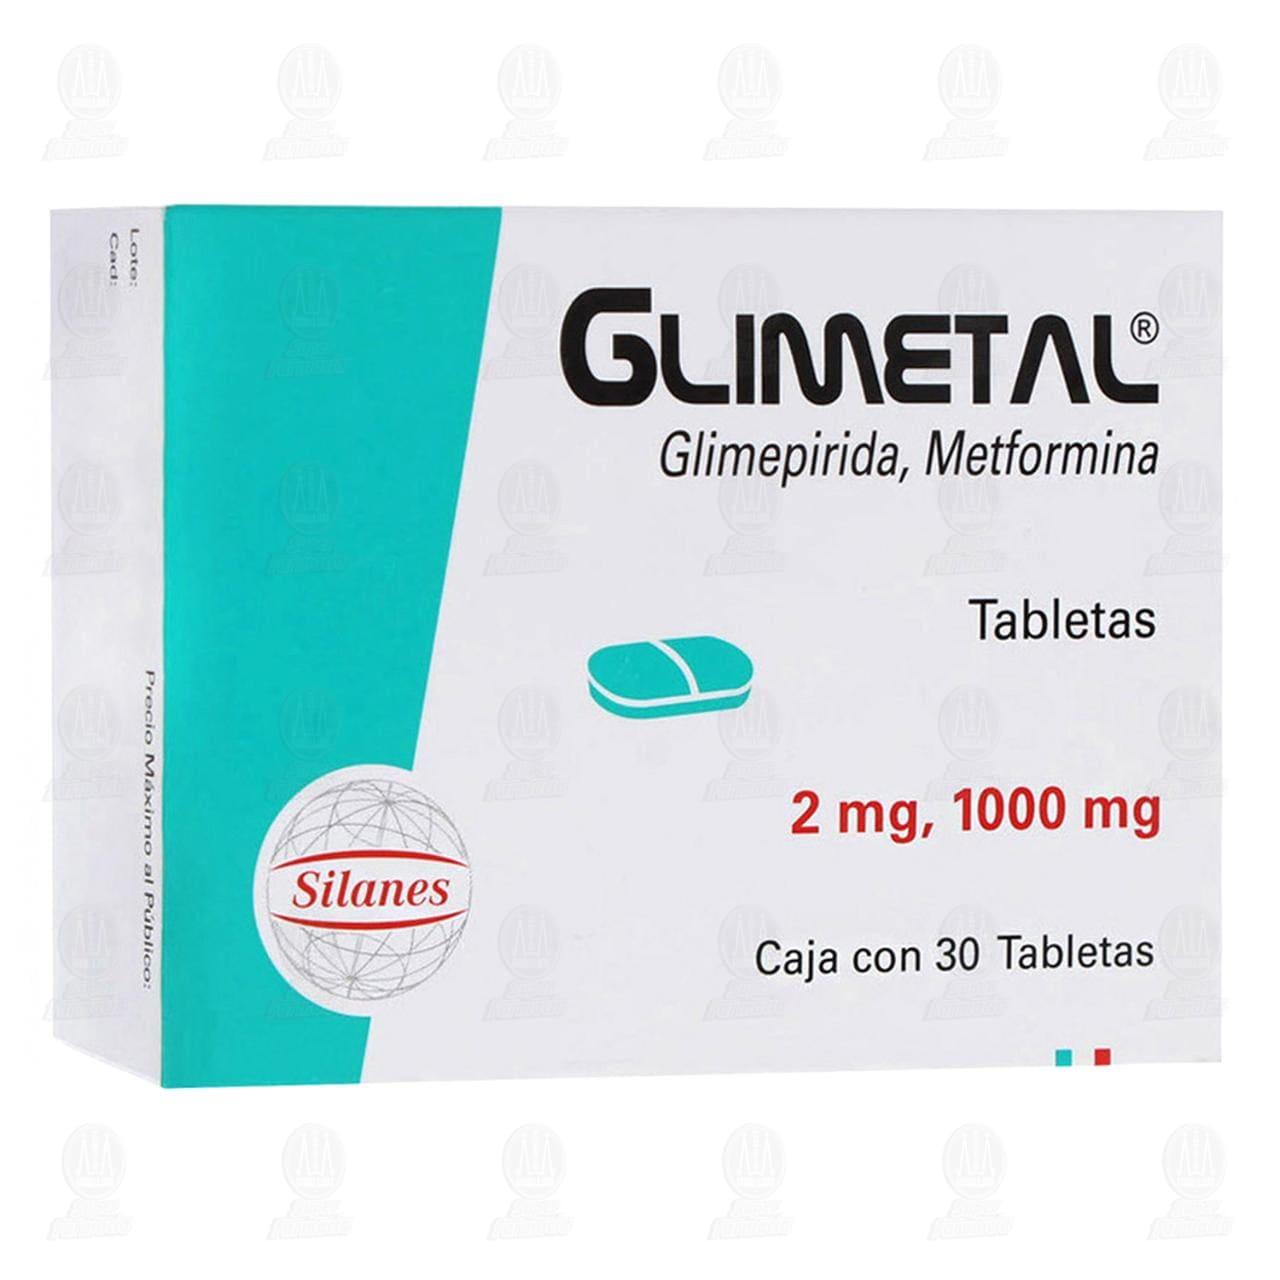 Comprar Glimetal 2mg/1000mg 30 Tabletas en Farmacias Guadalajara